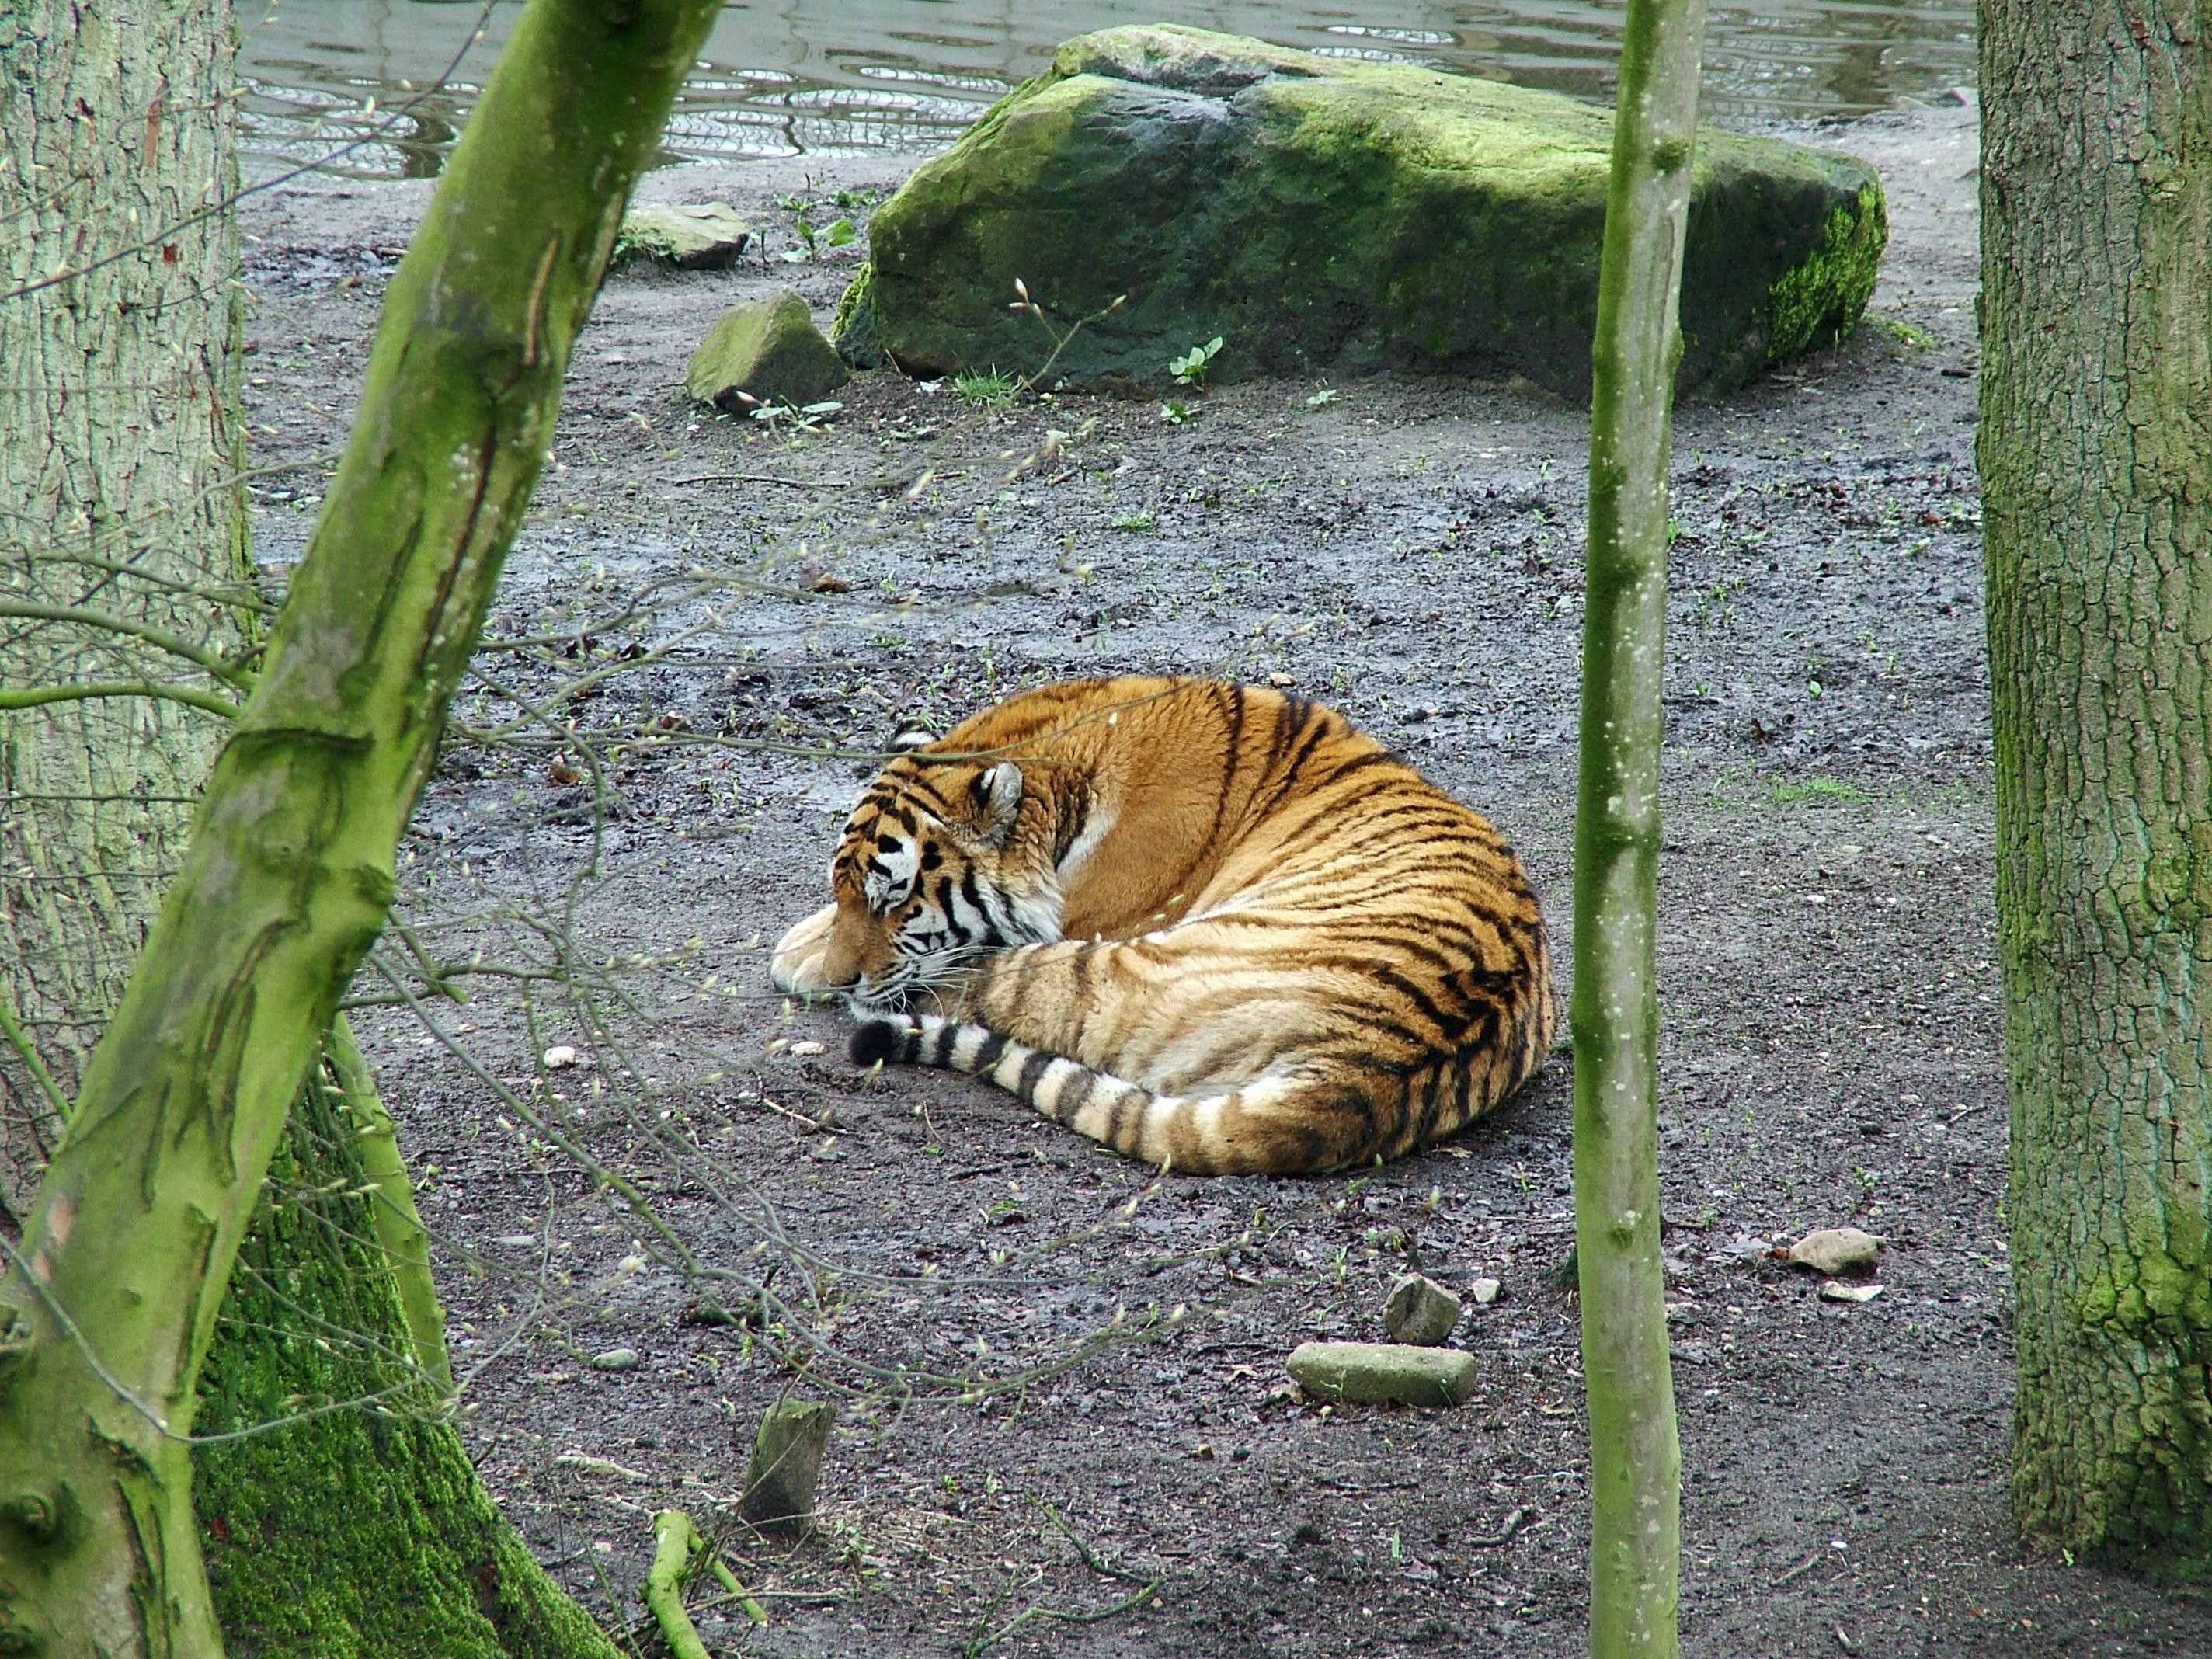 File:Sleeping tiger.jpg - Wikimedia Commons